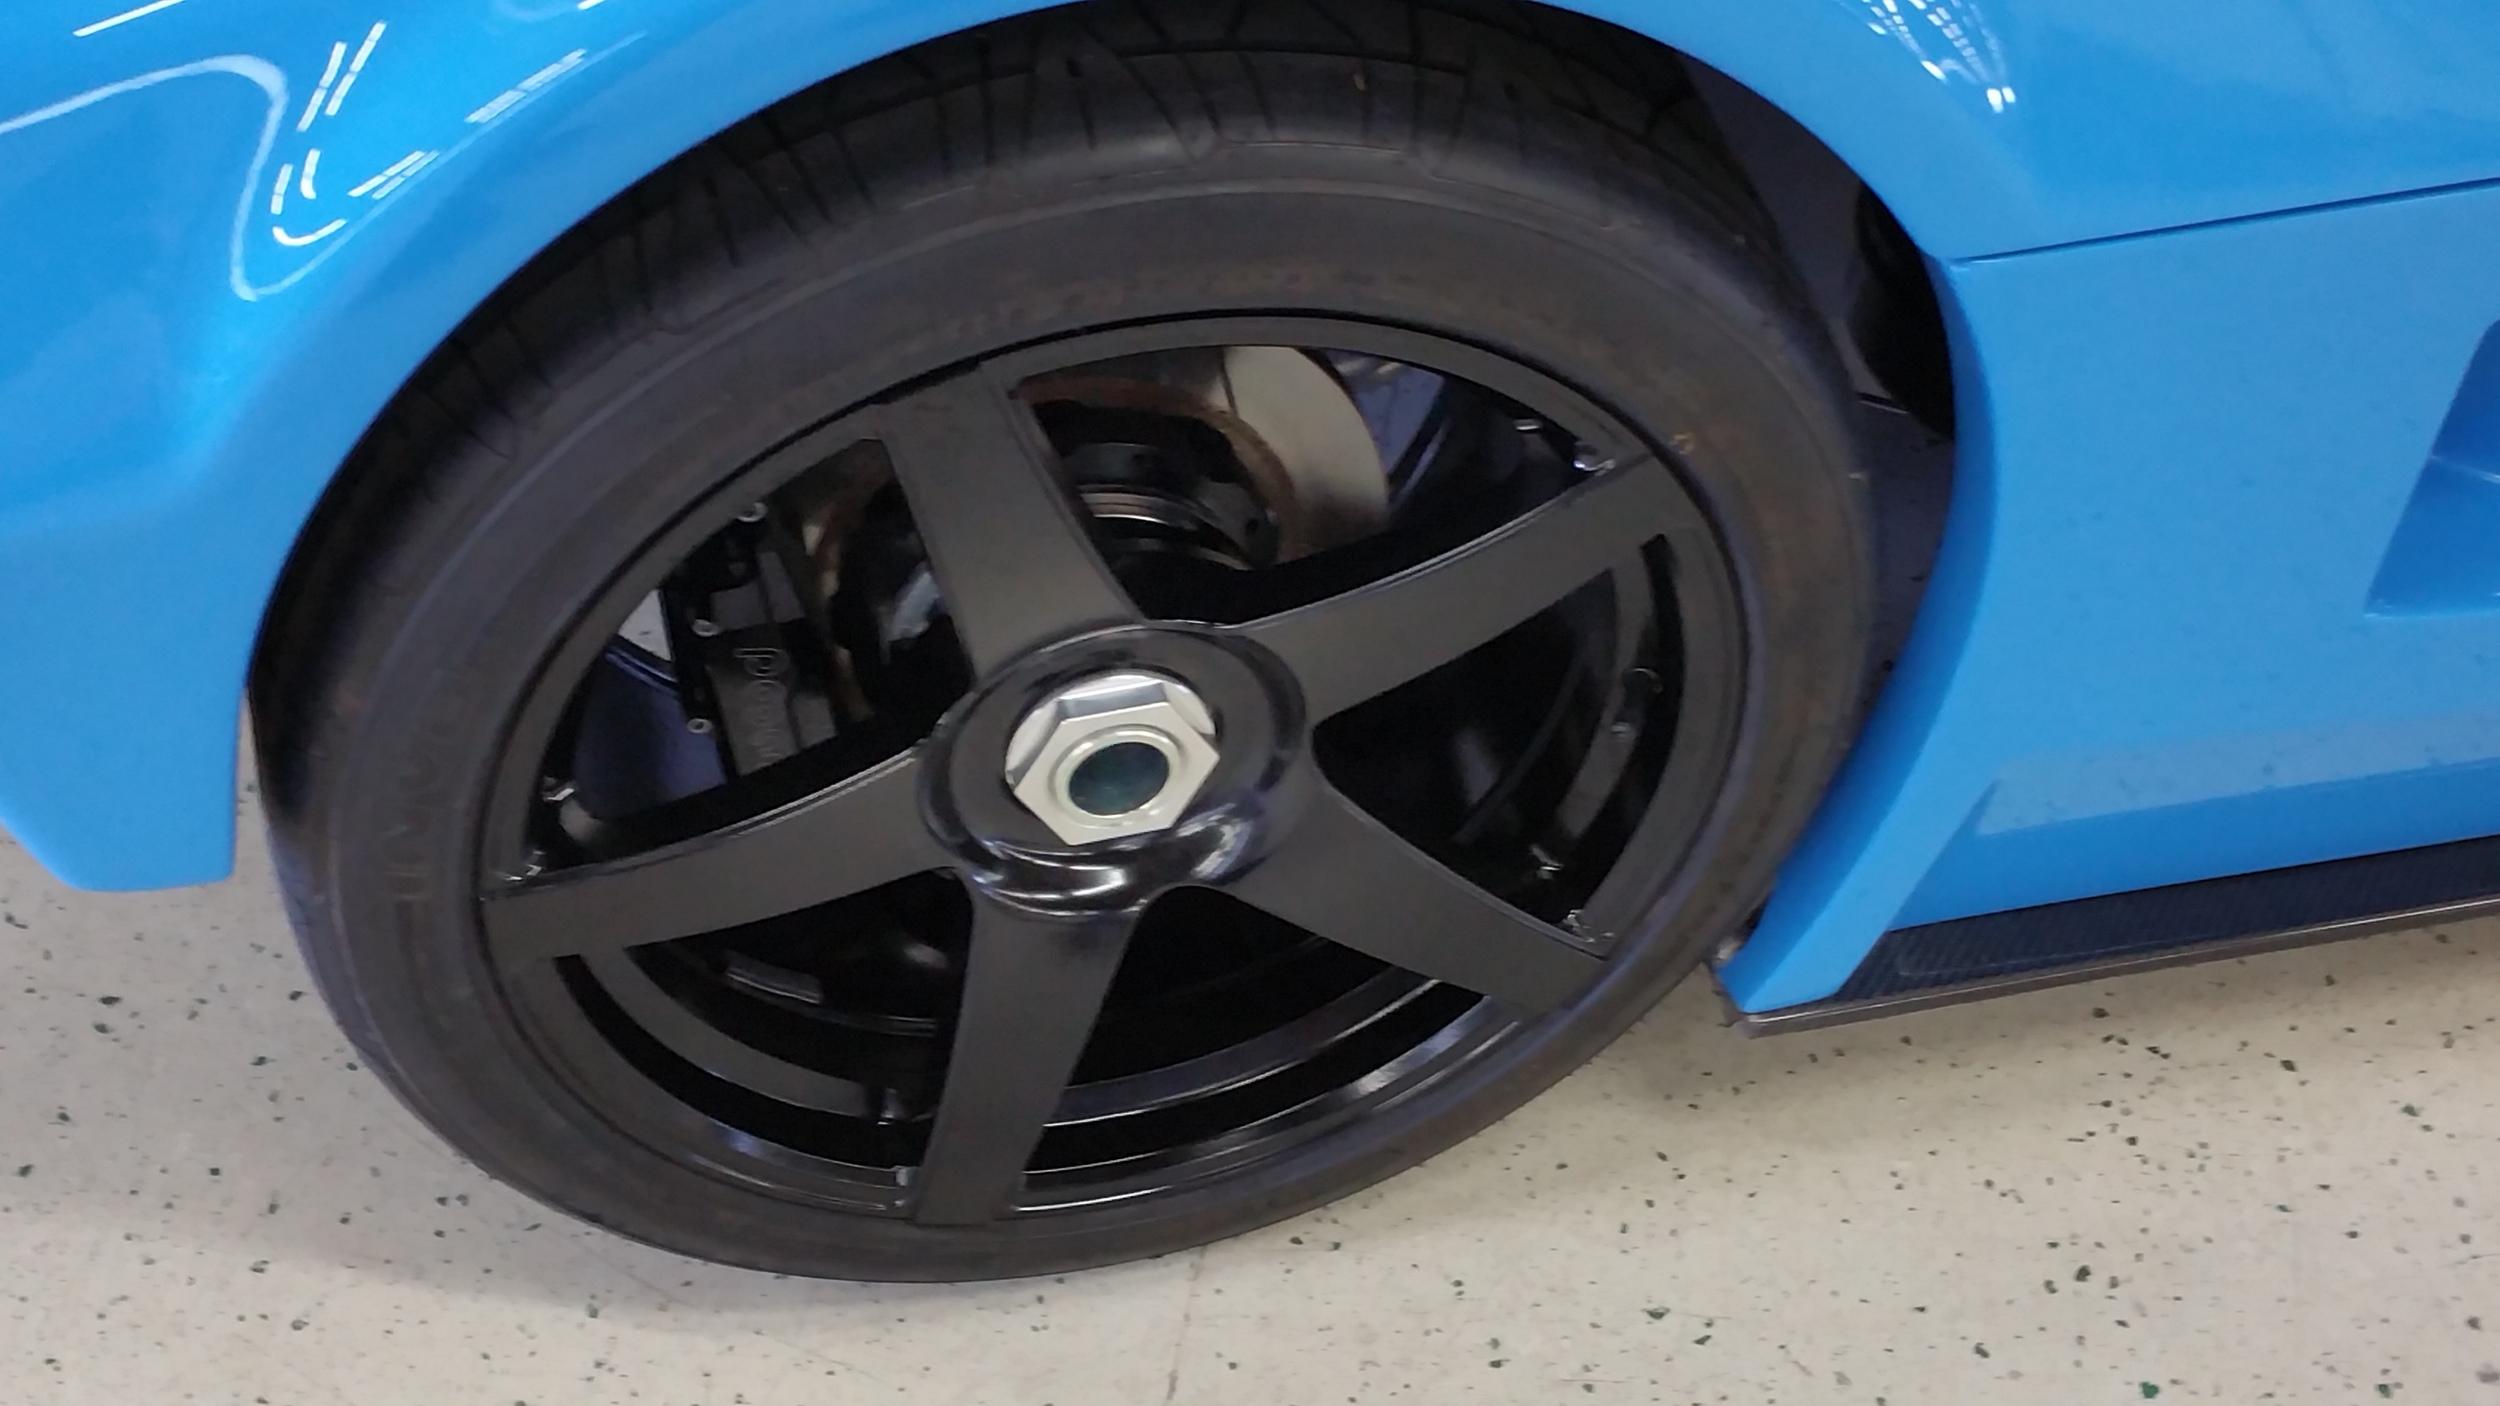 Centerlock wheel on a Superlite SLC.